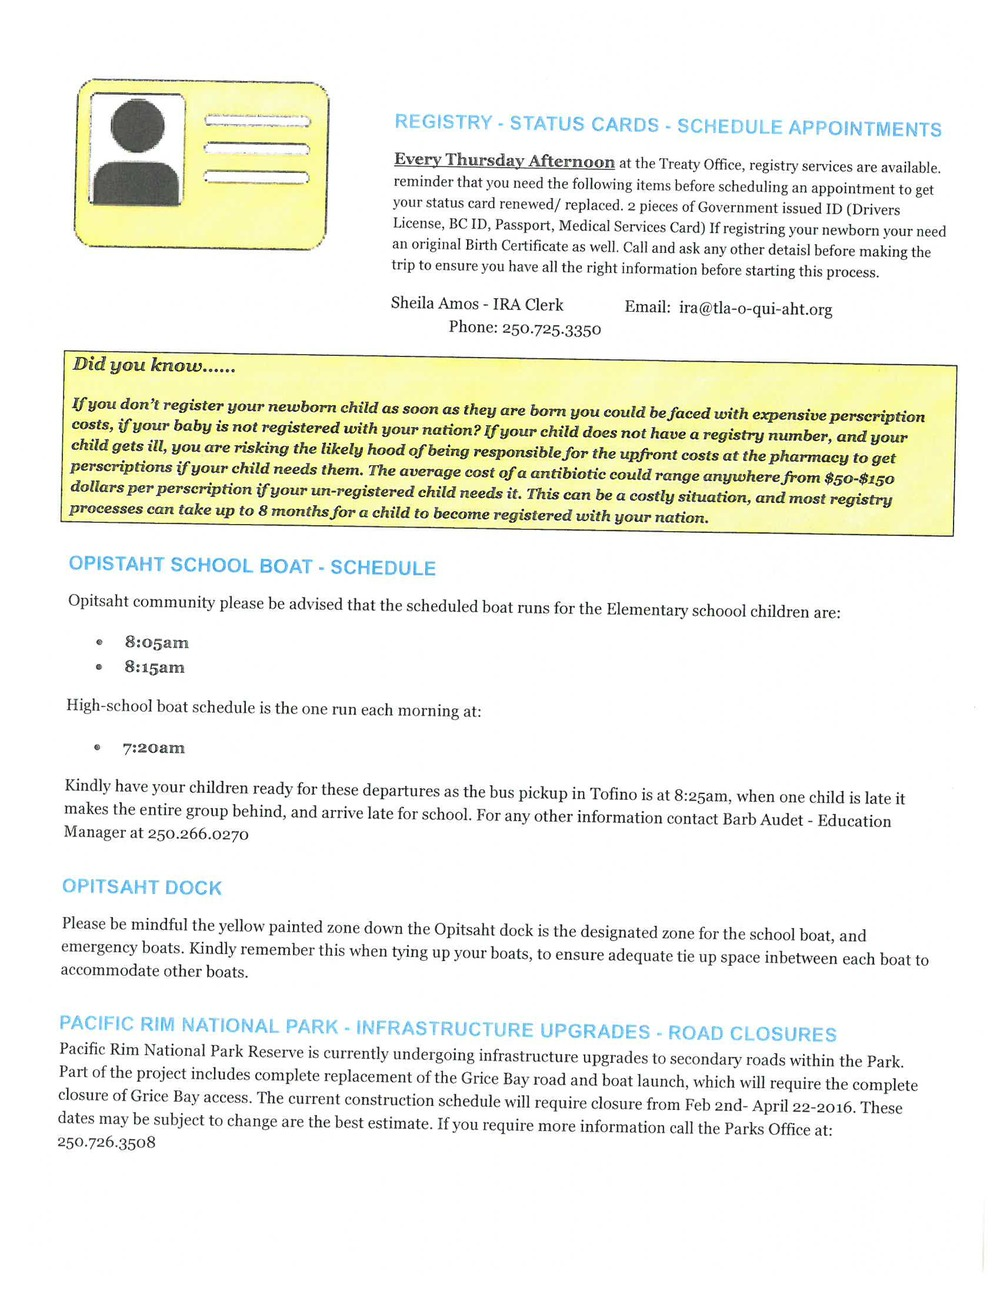 TFN Bulletin Mar 1-2016_Page_02.jpg